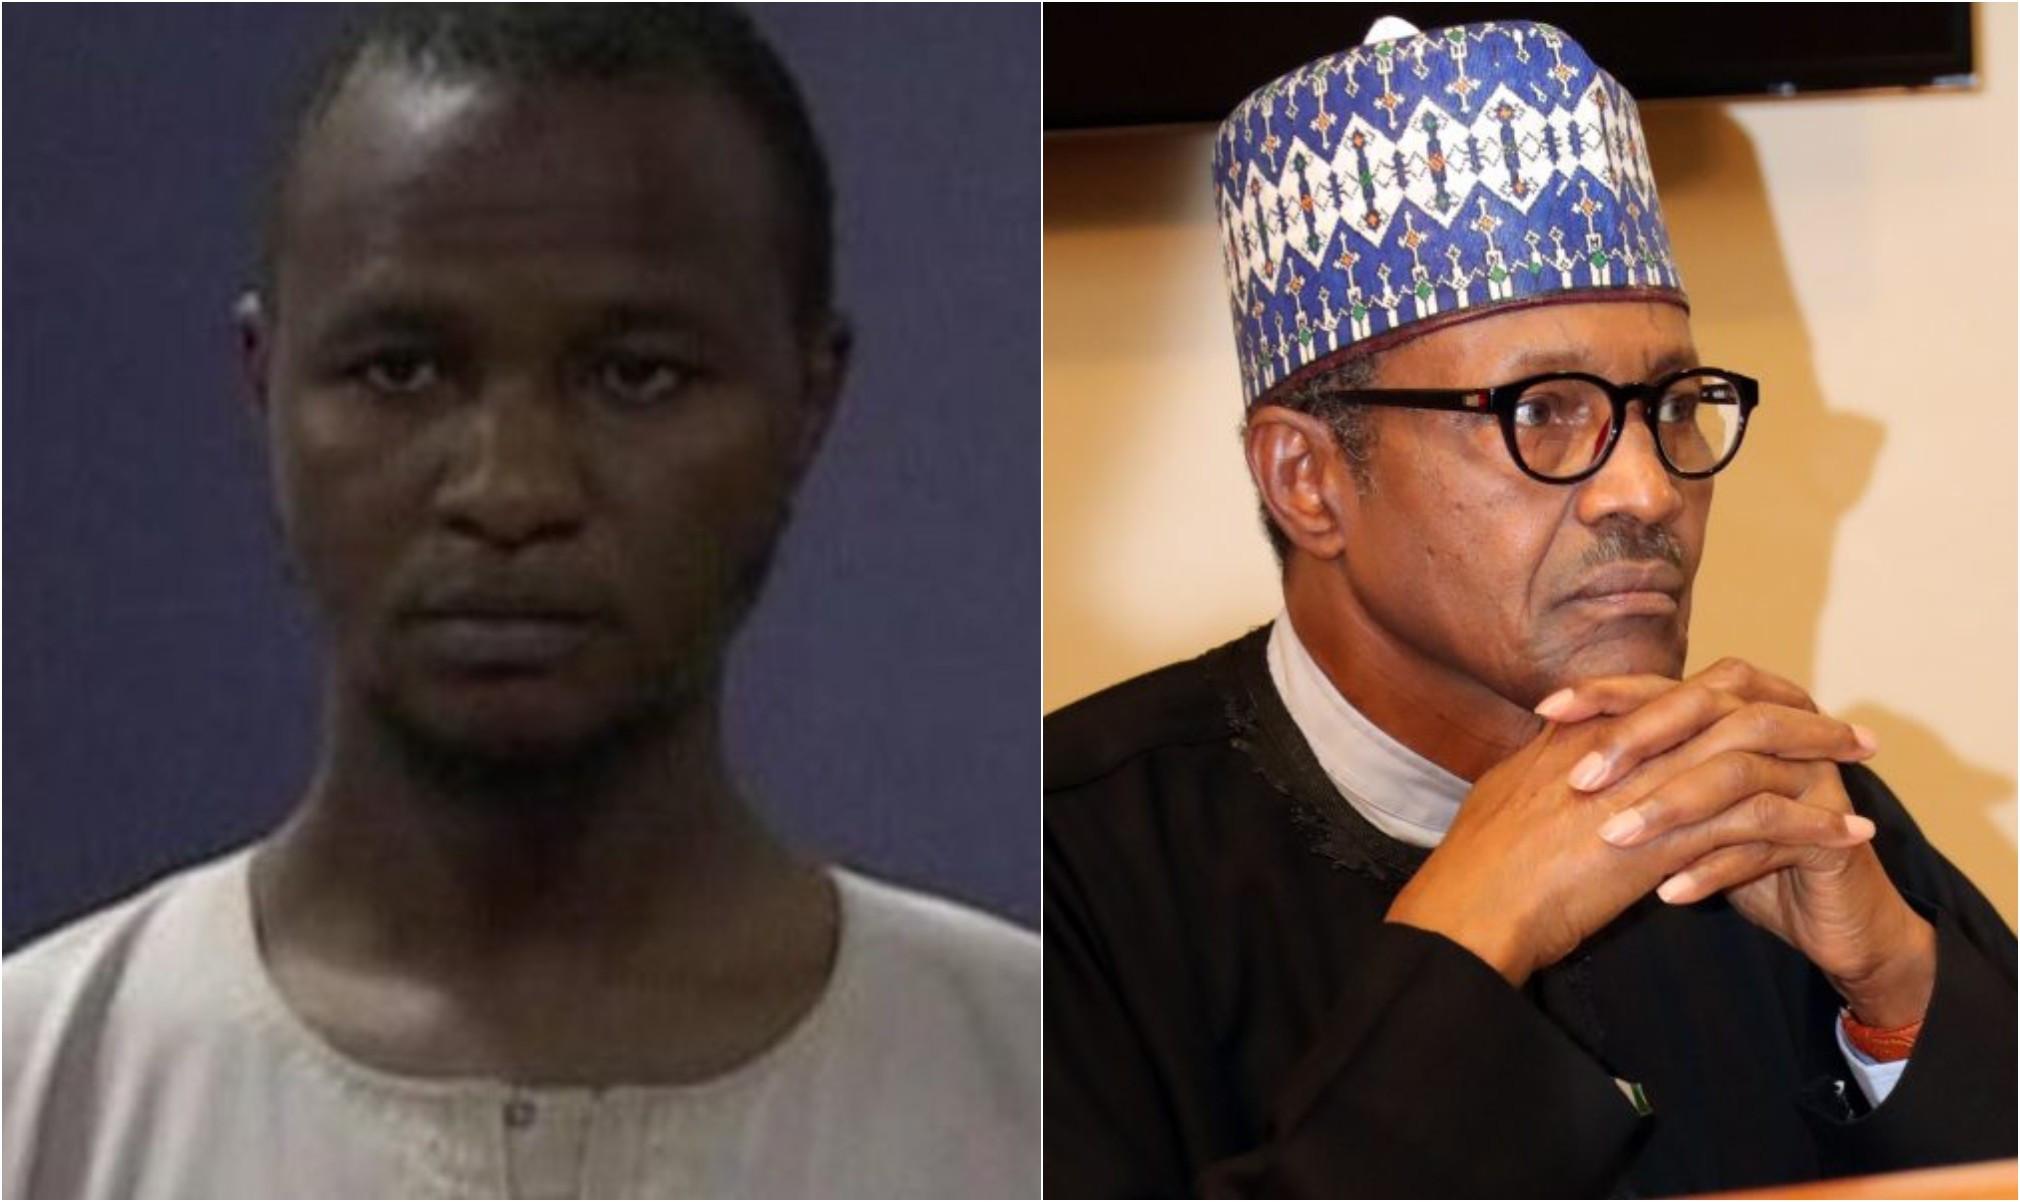 Alleged mastermind of Buhari's fake wedding arraigned, faces 3 years imprisonment lindaikejisblog